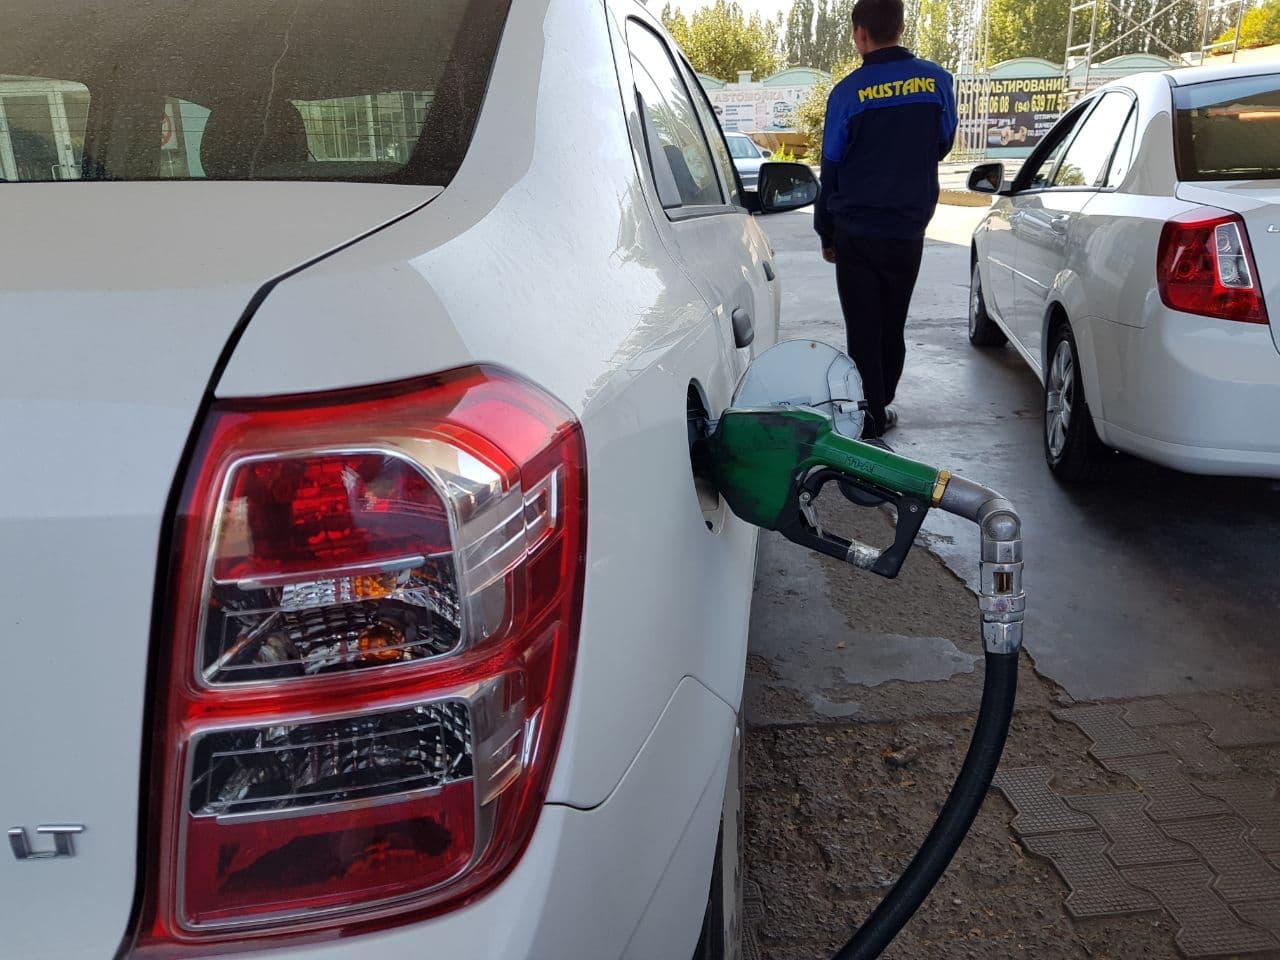 На заправках Узбекистана не прекращается рост цен на бензин, АИ-80 местами стоит 6100 сумов за литр, АИ-92 - 7900, а АИ-95 - 8700 сумов за литр.